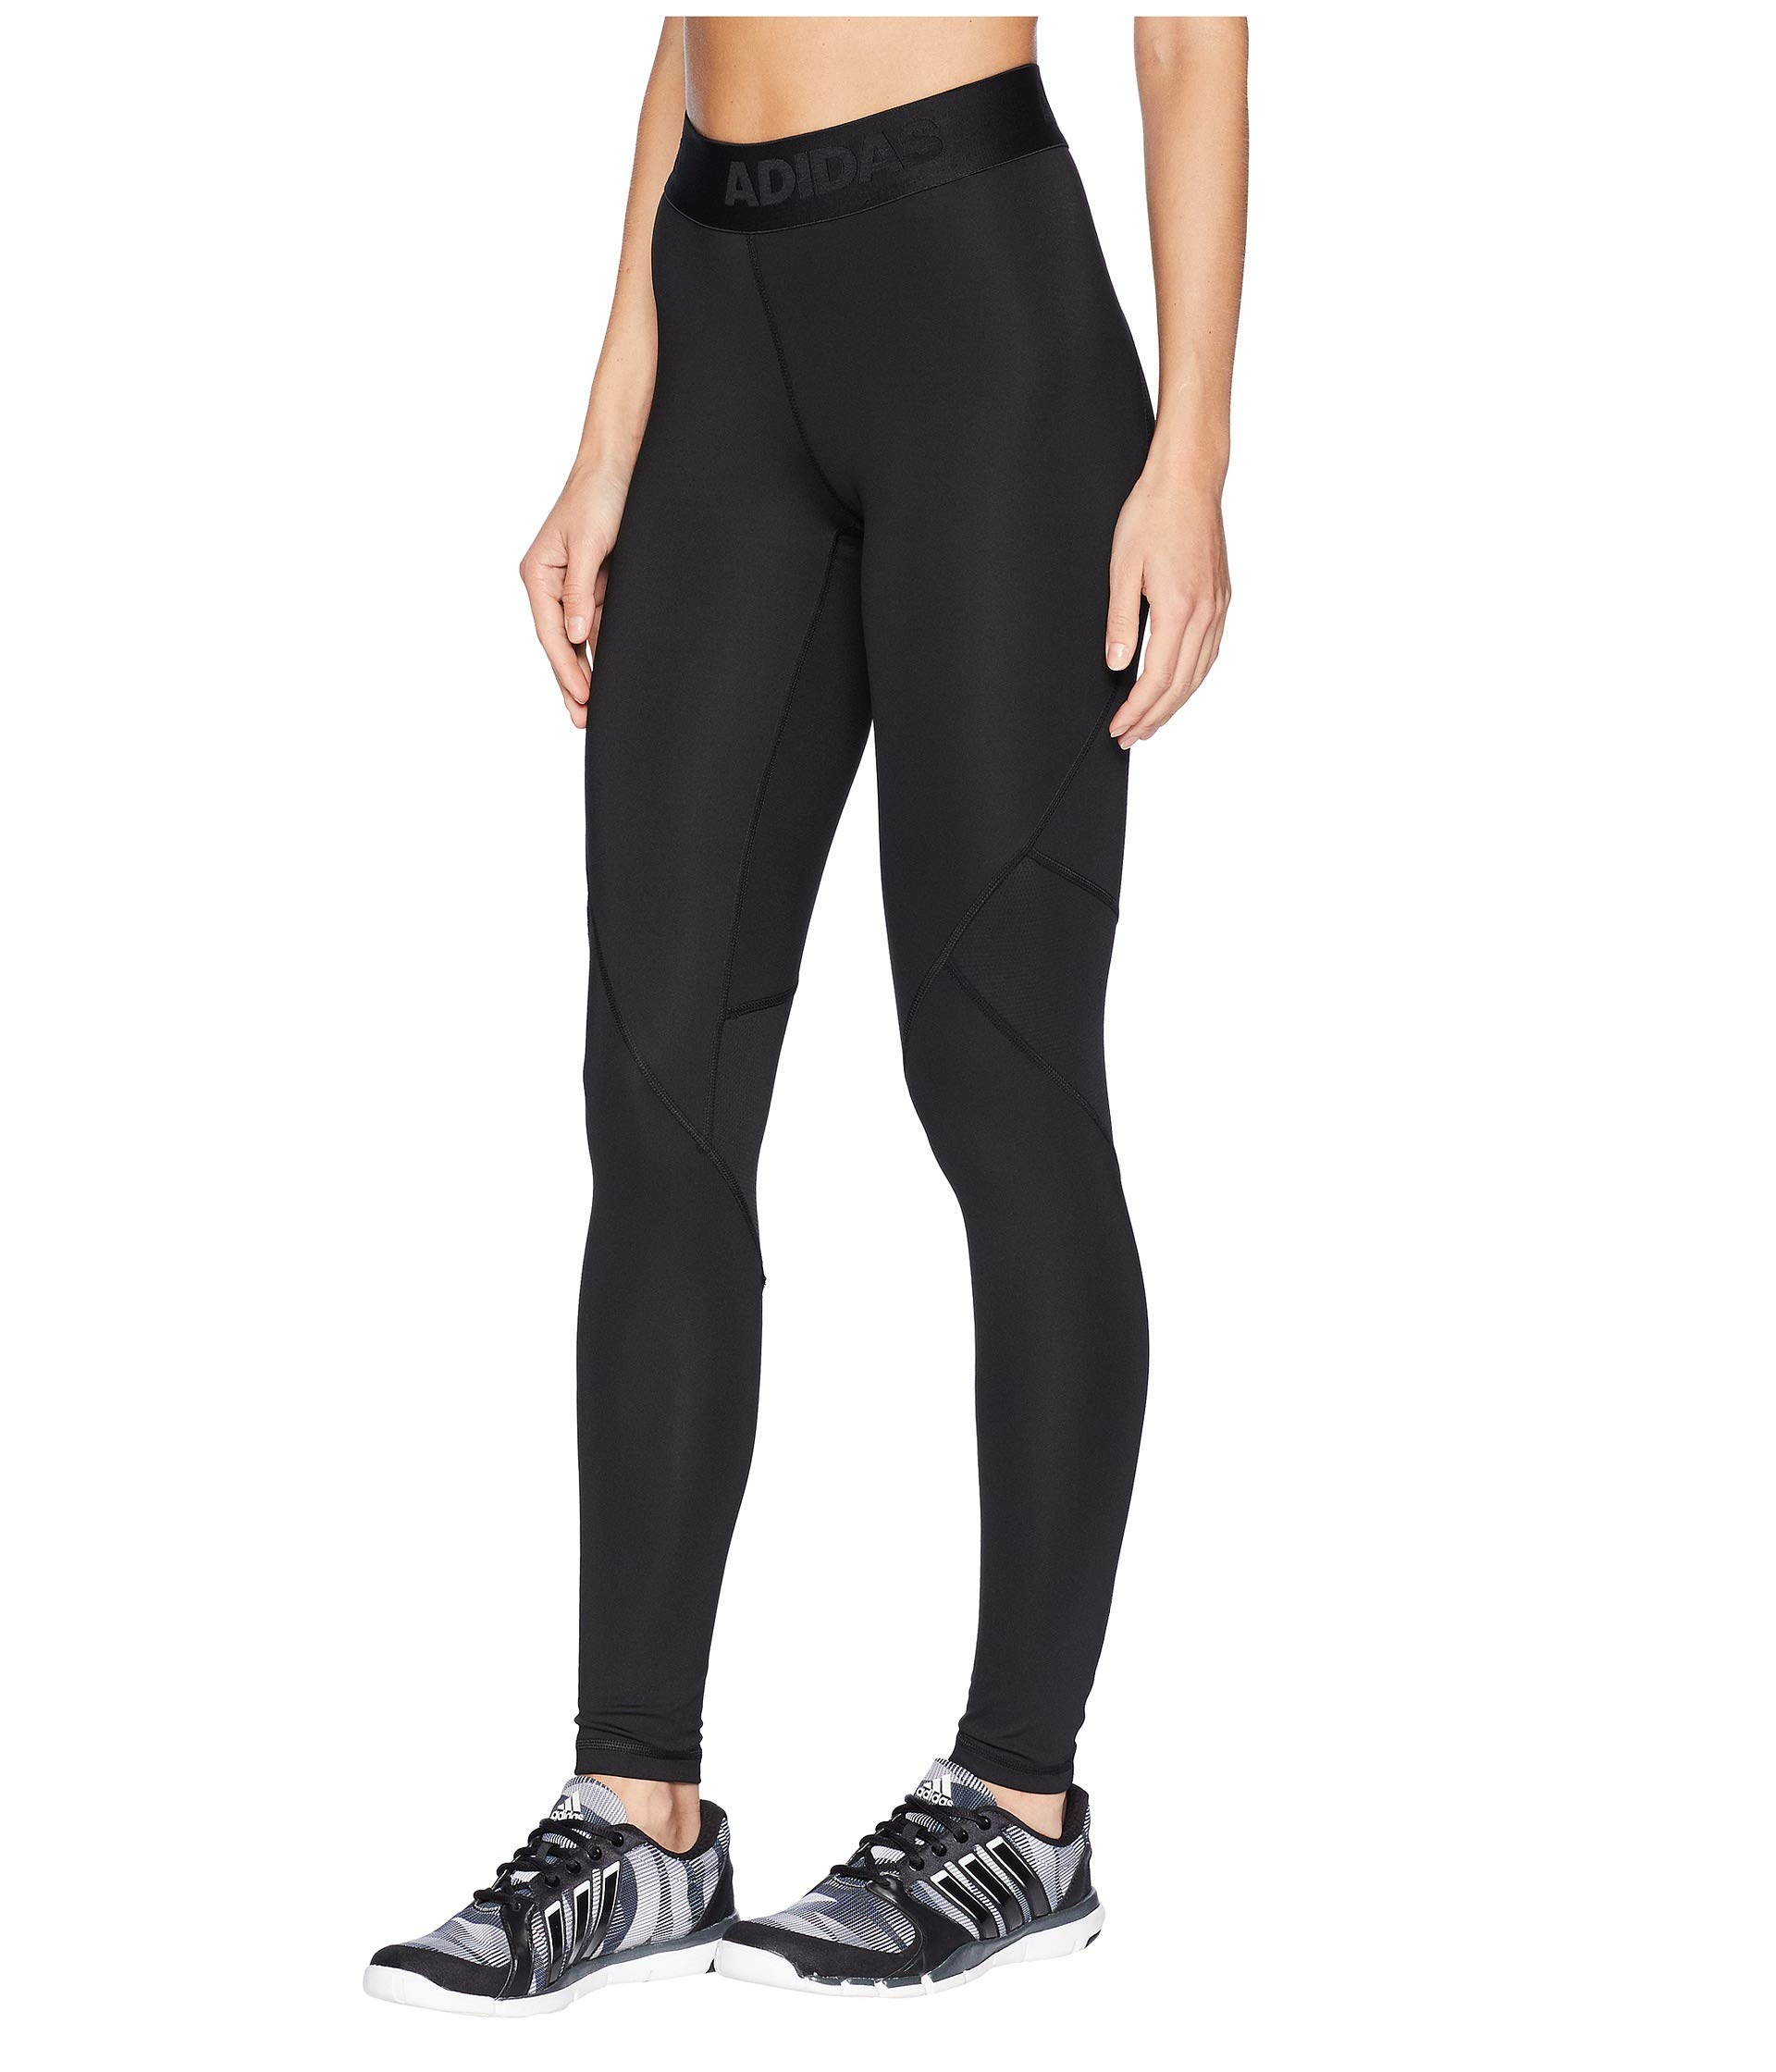 Tights Long Adidas Alphaskin Black Sport qaTUgTxWw1